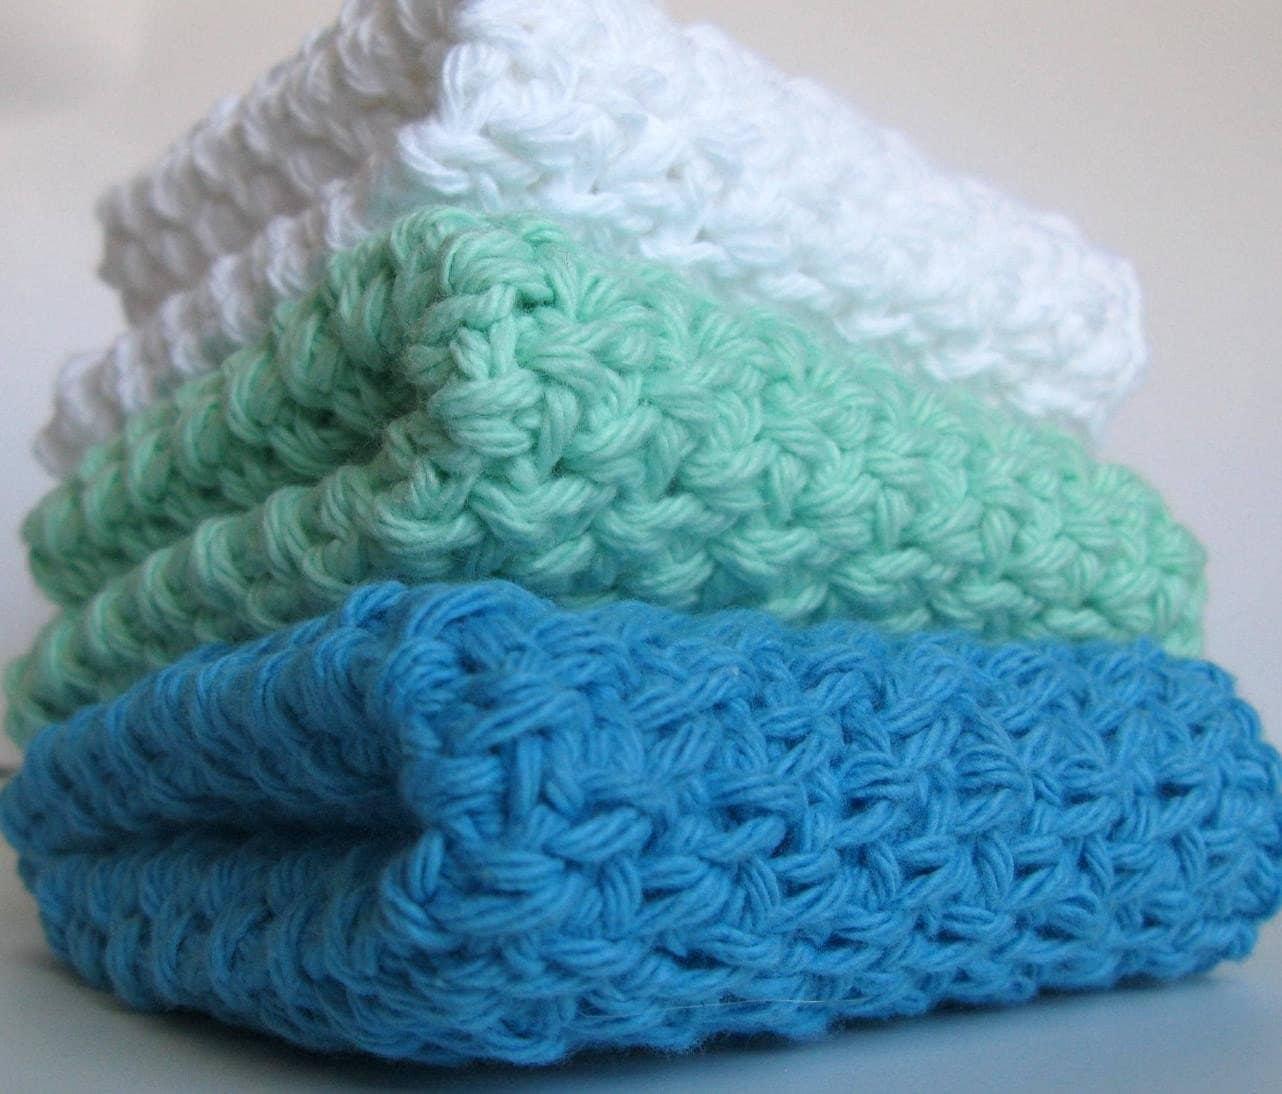 Crochet Maggies Ocean Waves Dish Cloths